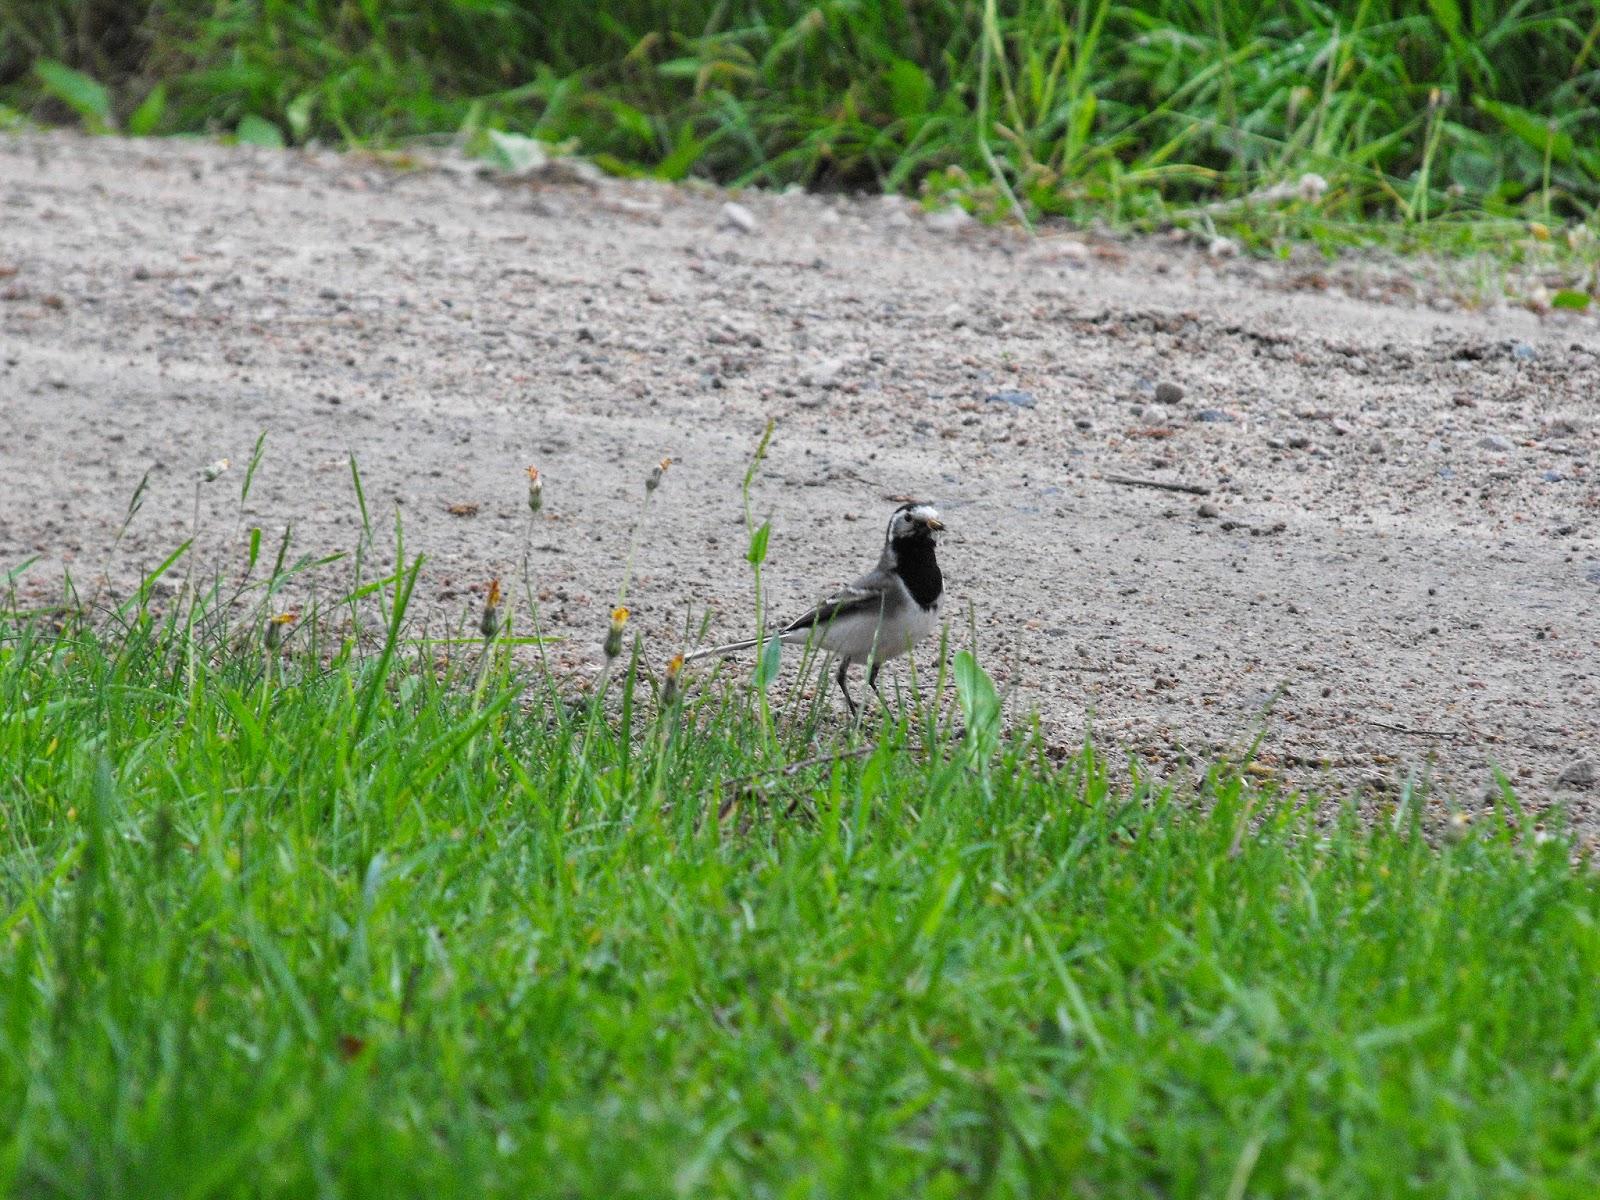 vackert fågelbo, Sösdala, fågelbo, Hässleholm, naturen, fåglar, Sädesärla